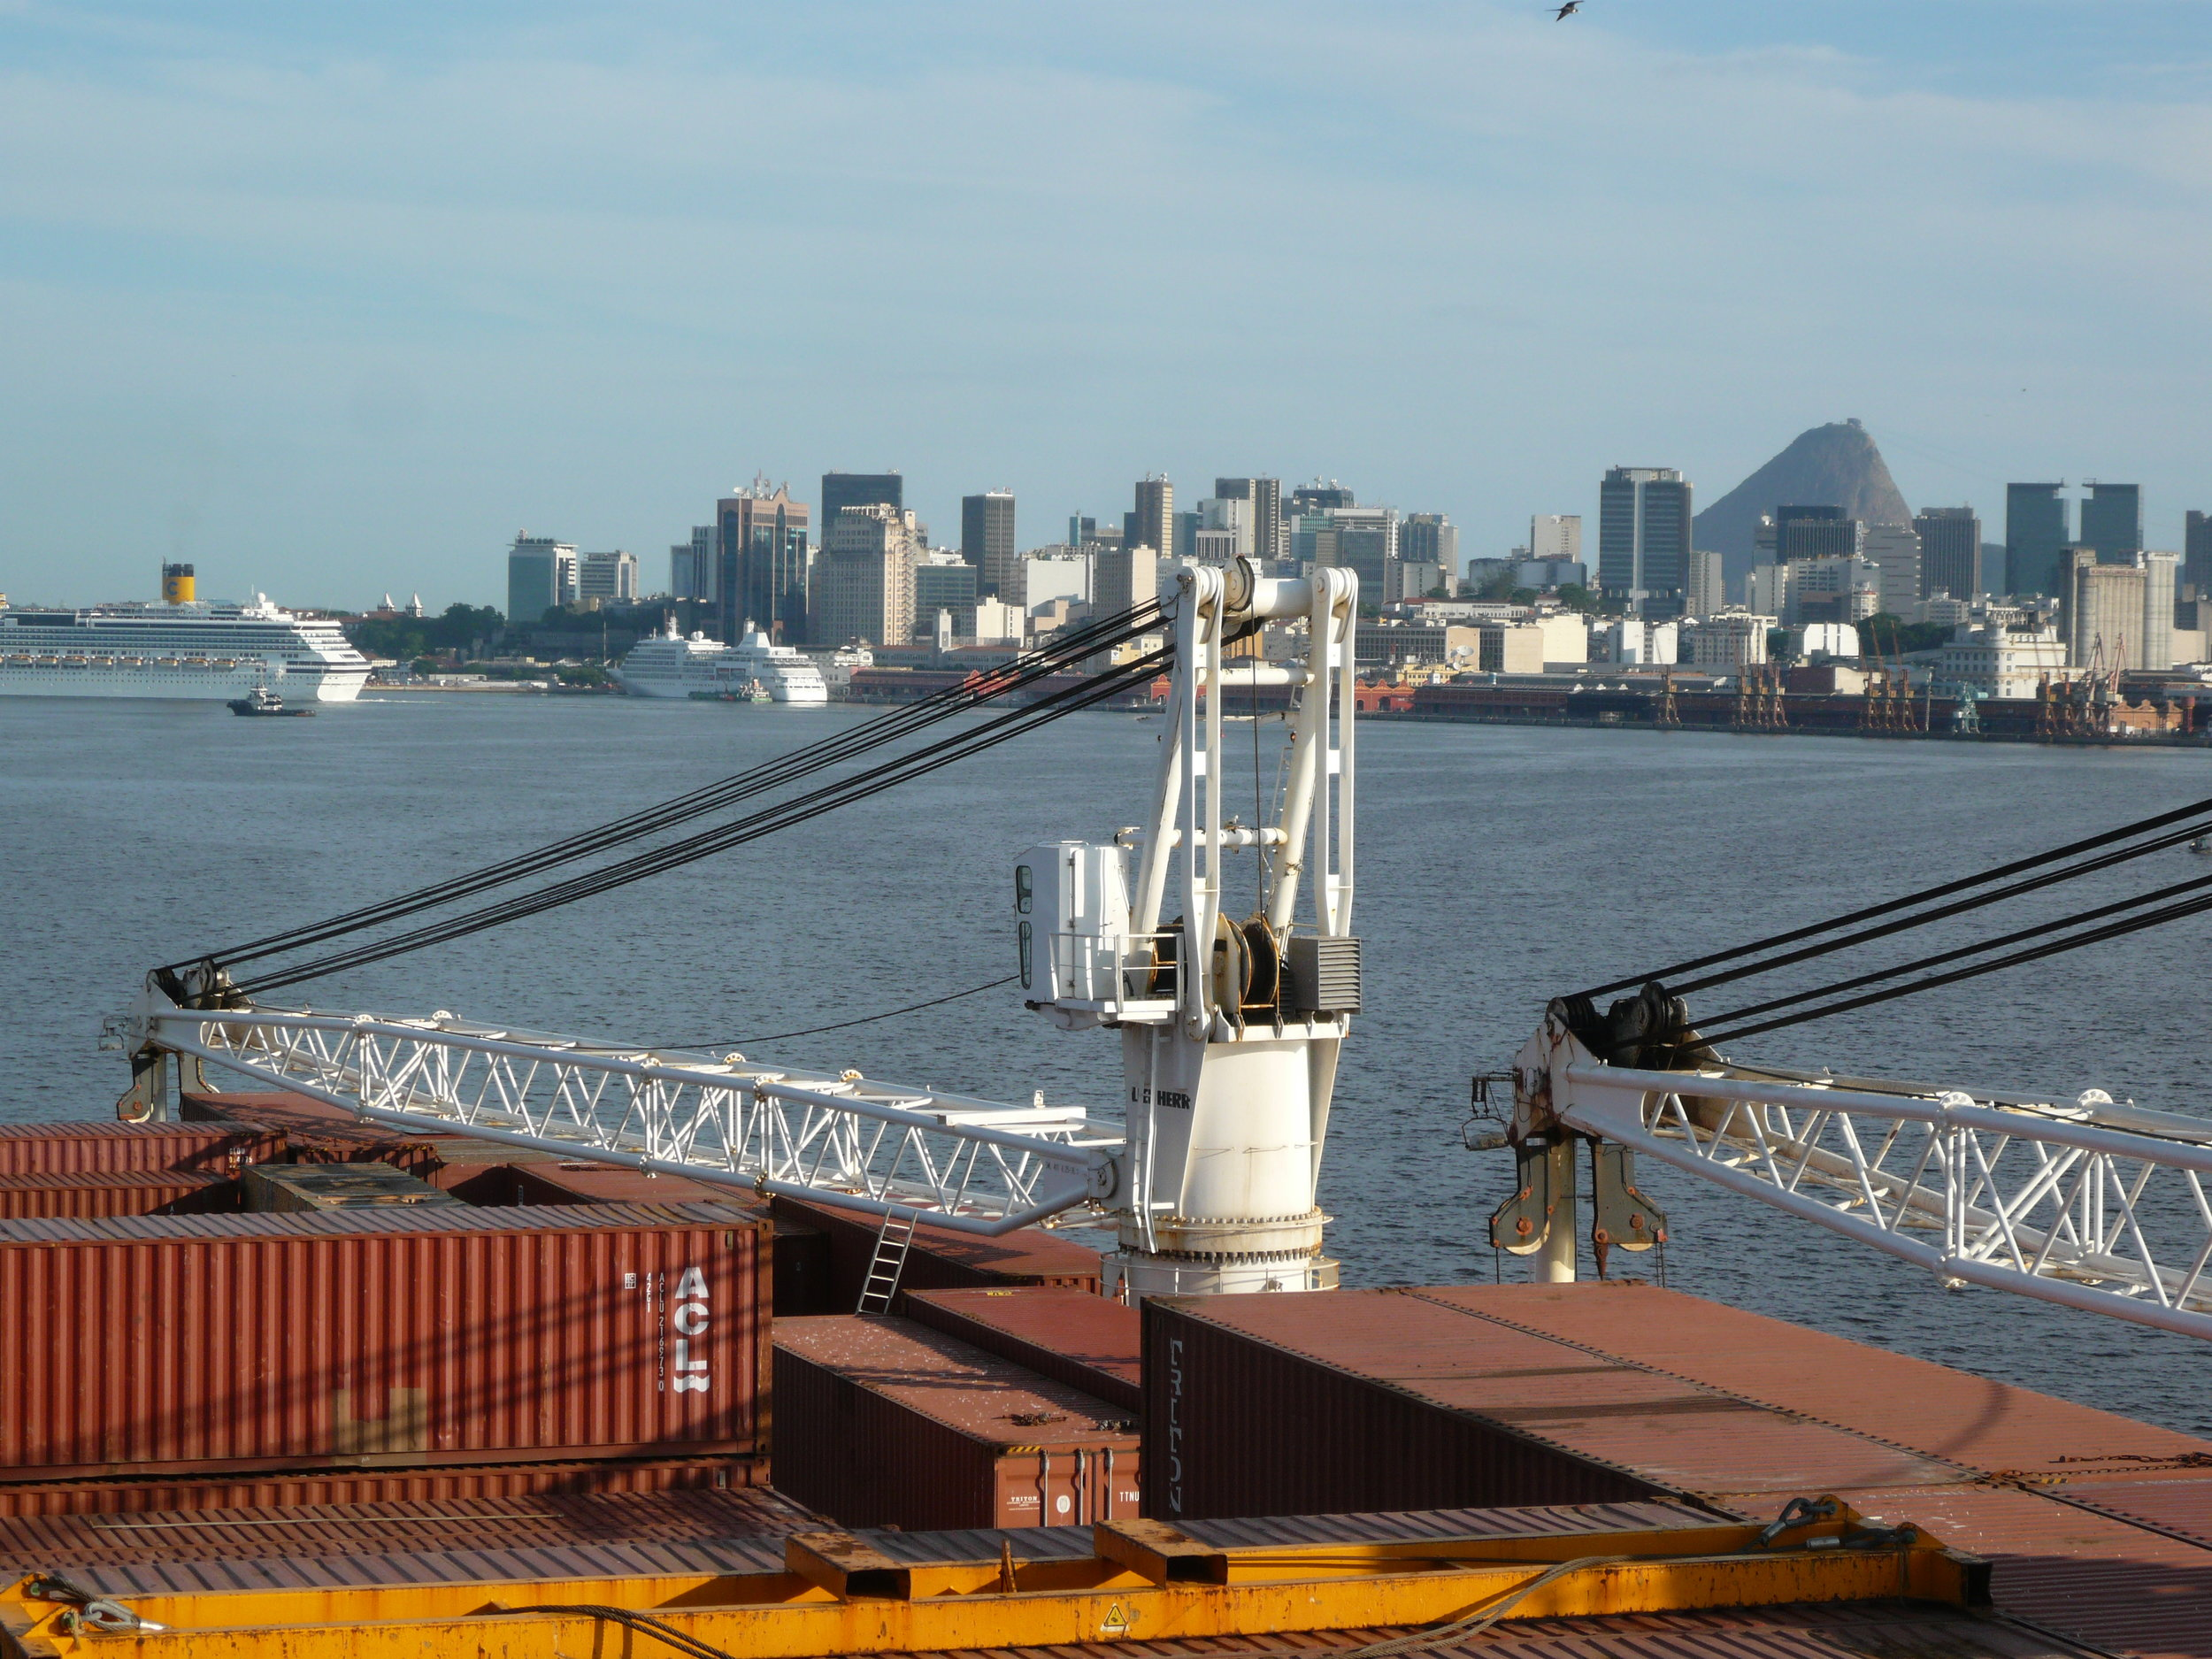 Rio de Janeiro, one of the port calls en route to Argentina.